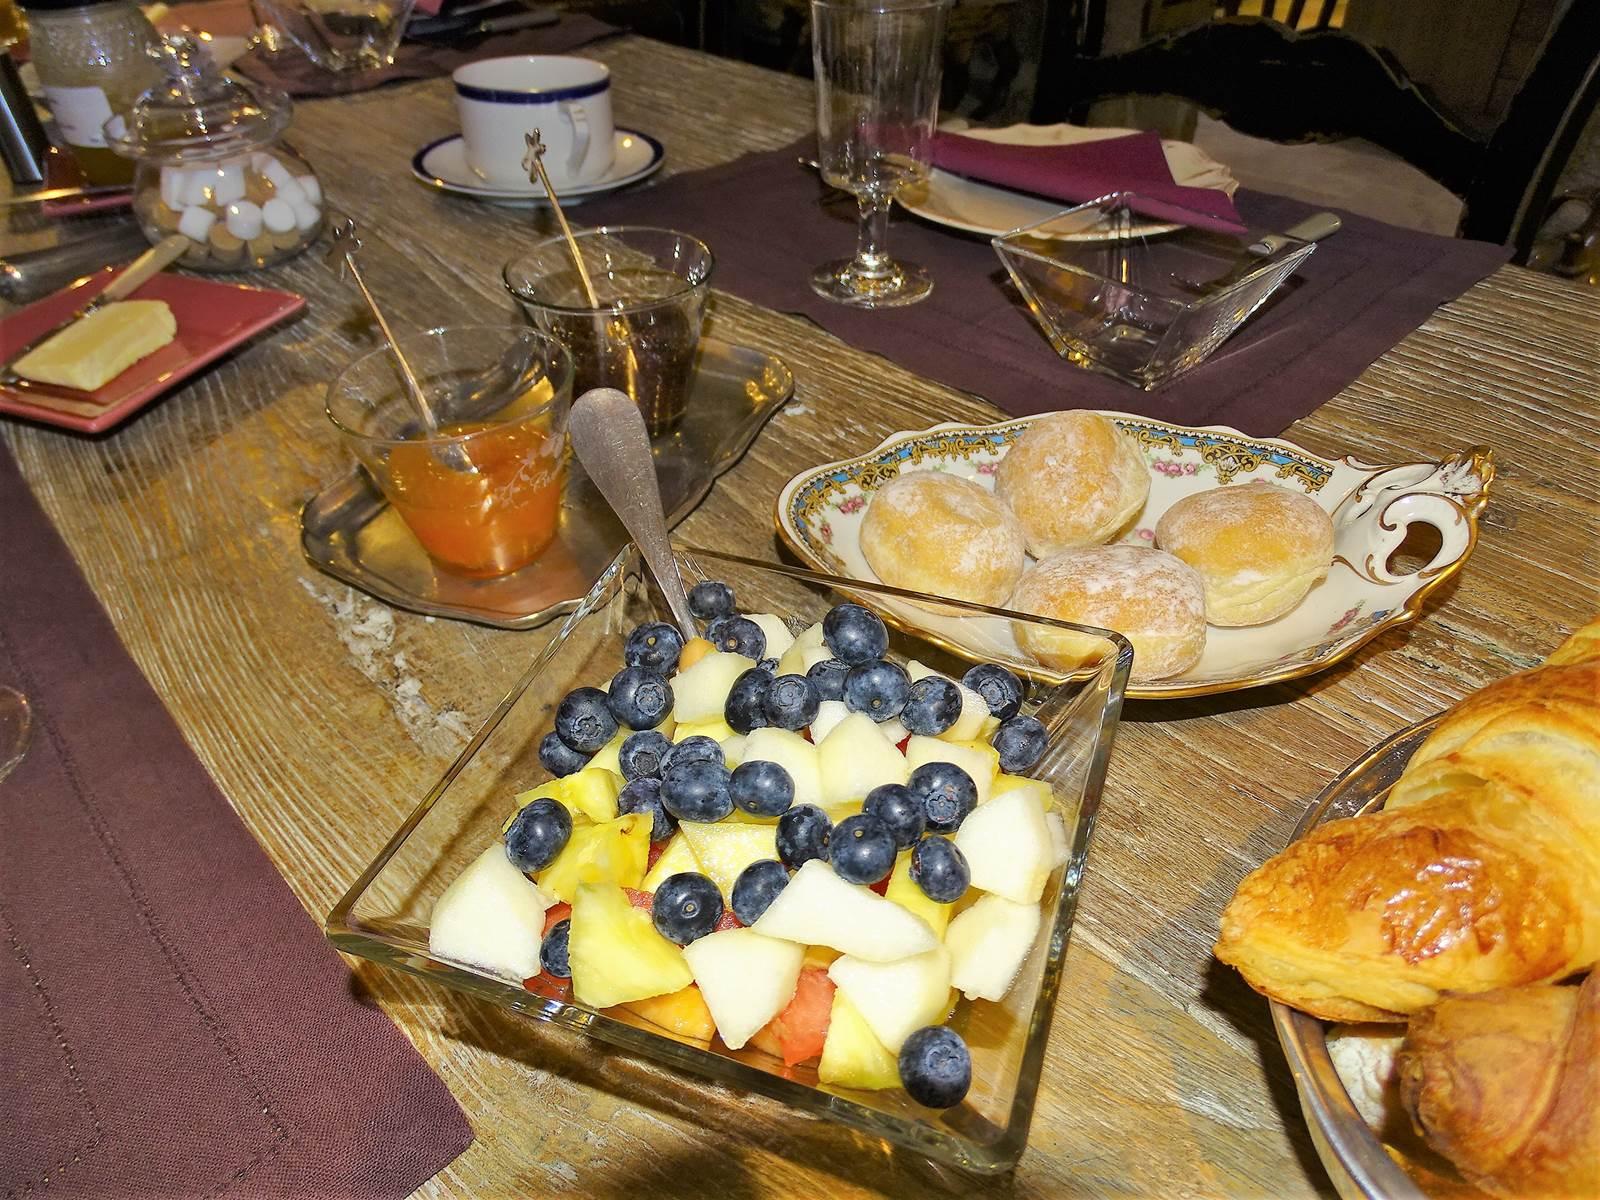 Petit déjeuner au Château de Crocq.